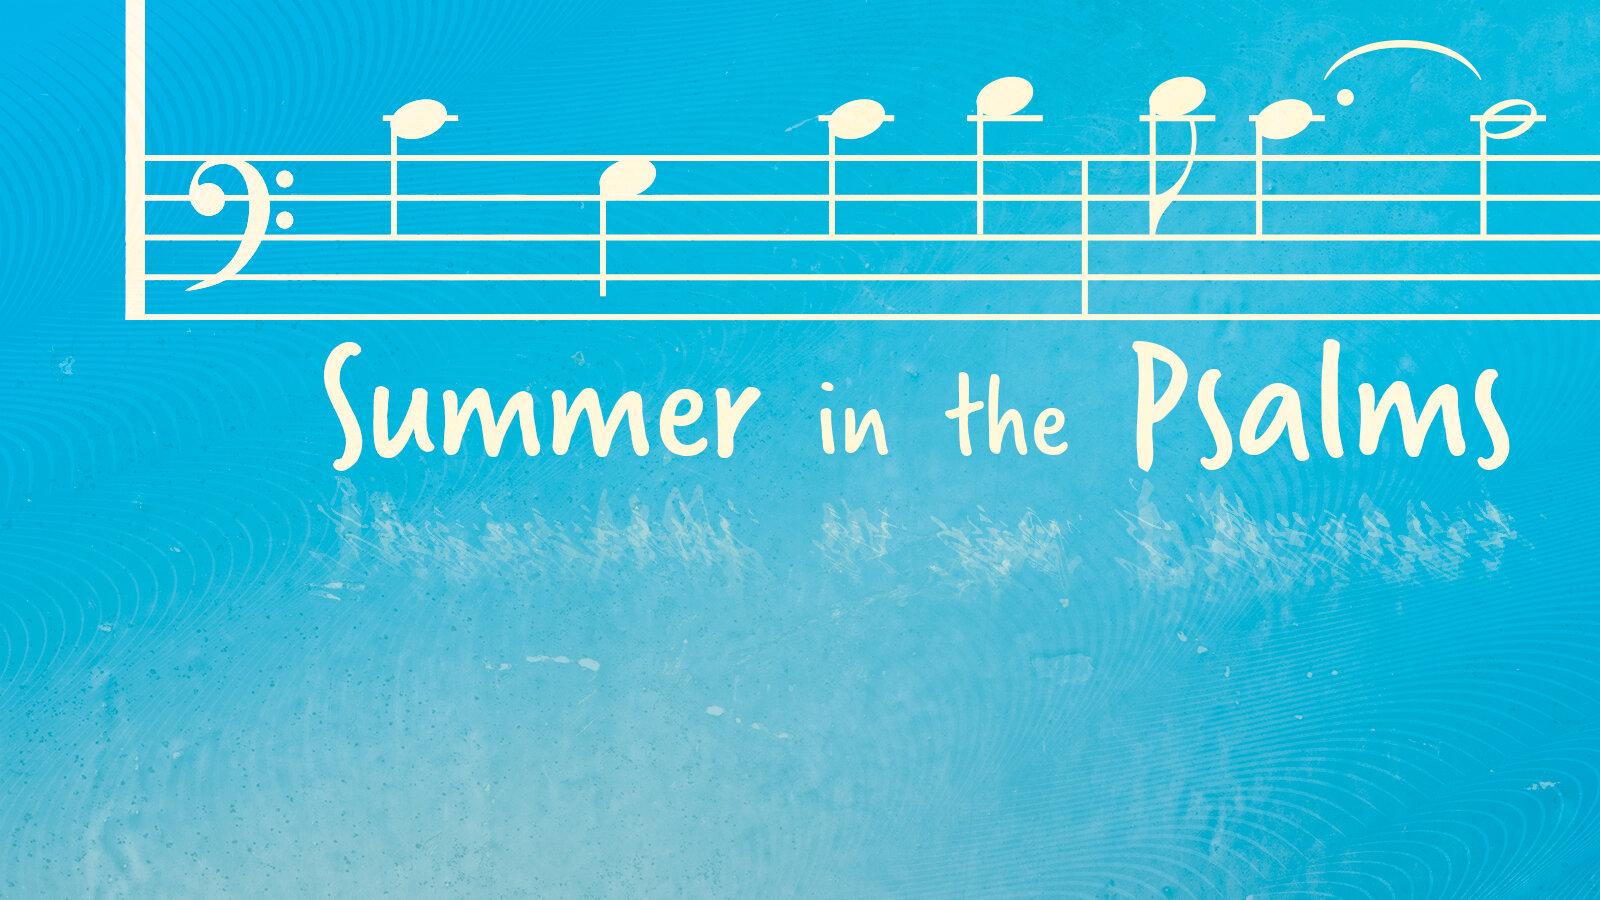 Summer-in-the-Psalms_ws.jpg